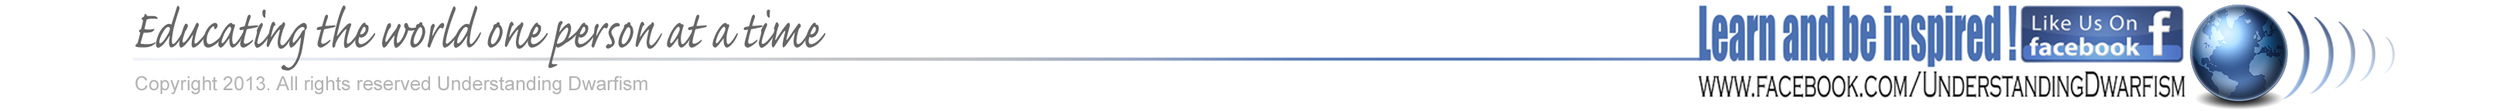 WEB SITE bottom page.jpg